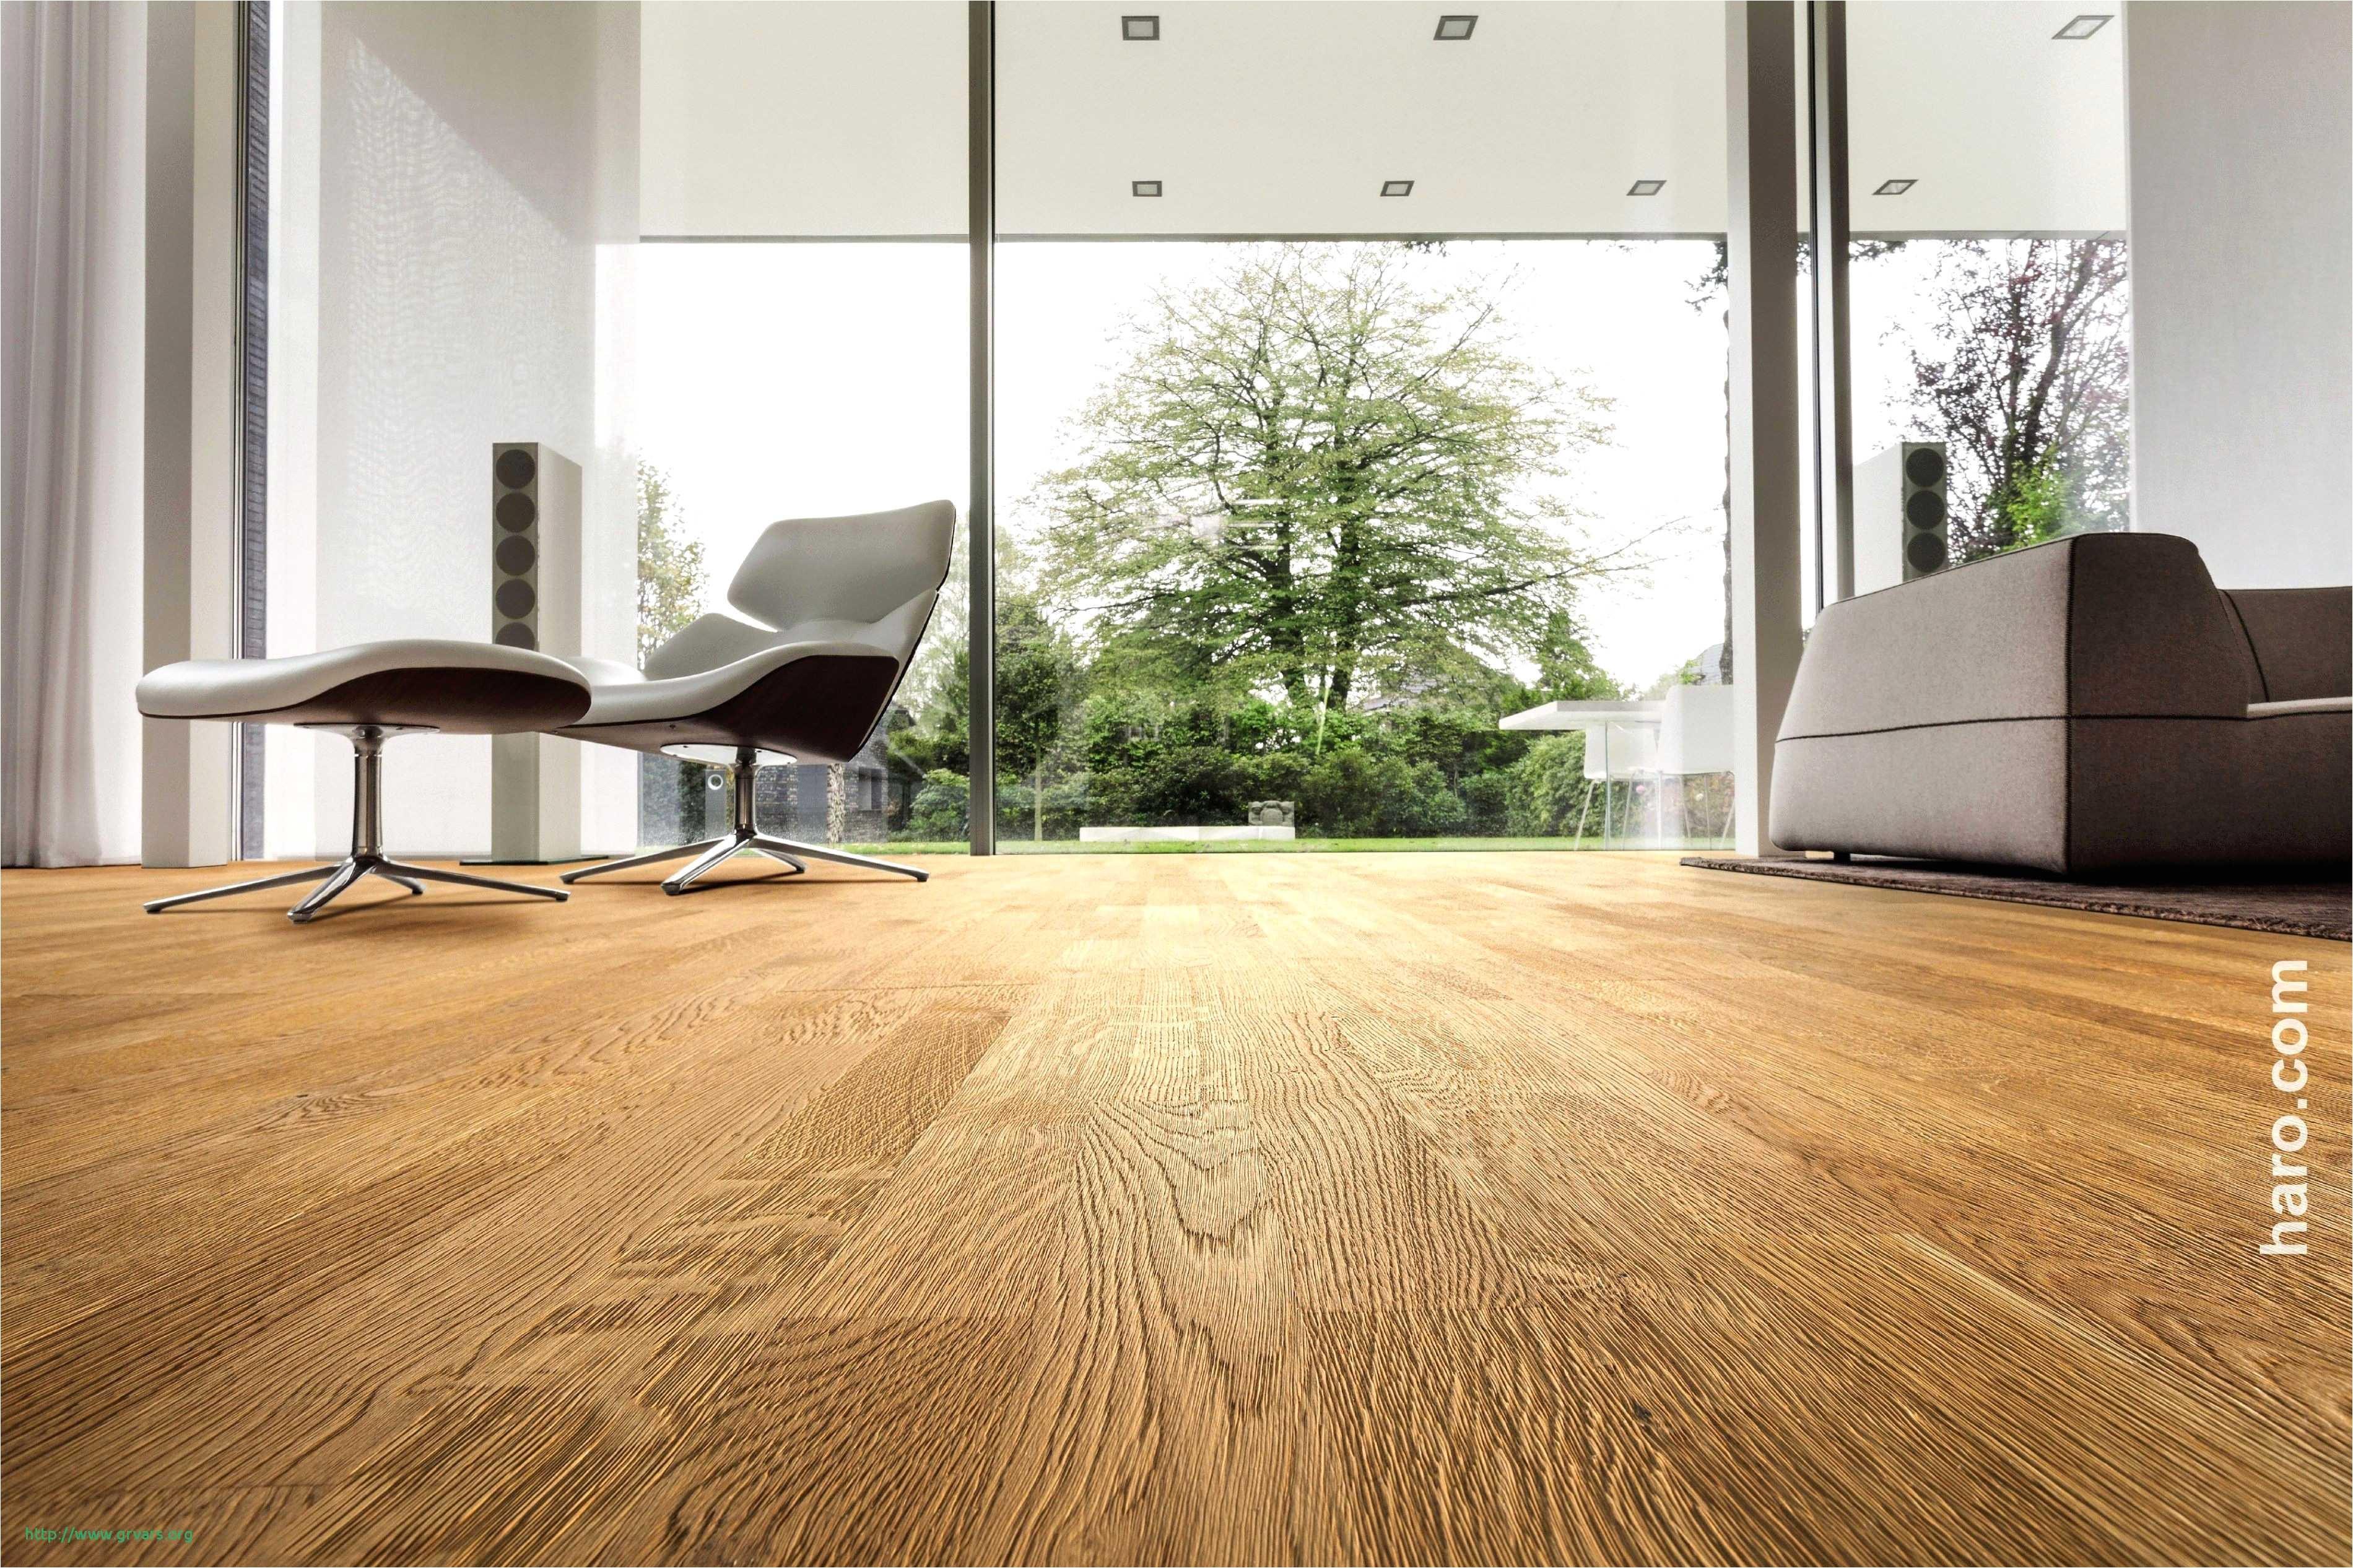 4 hardwood flooring of protect wood floors from furniture bradshomefurnishings with 24 a legant buy floors direct nashville ideas blog